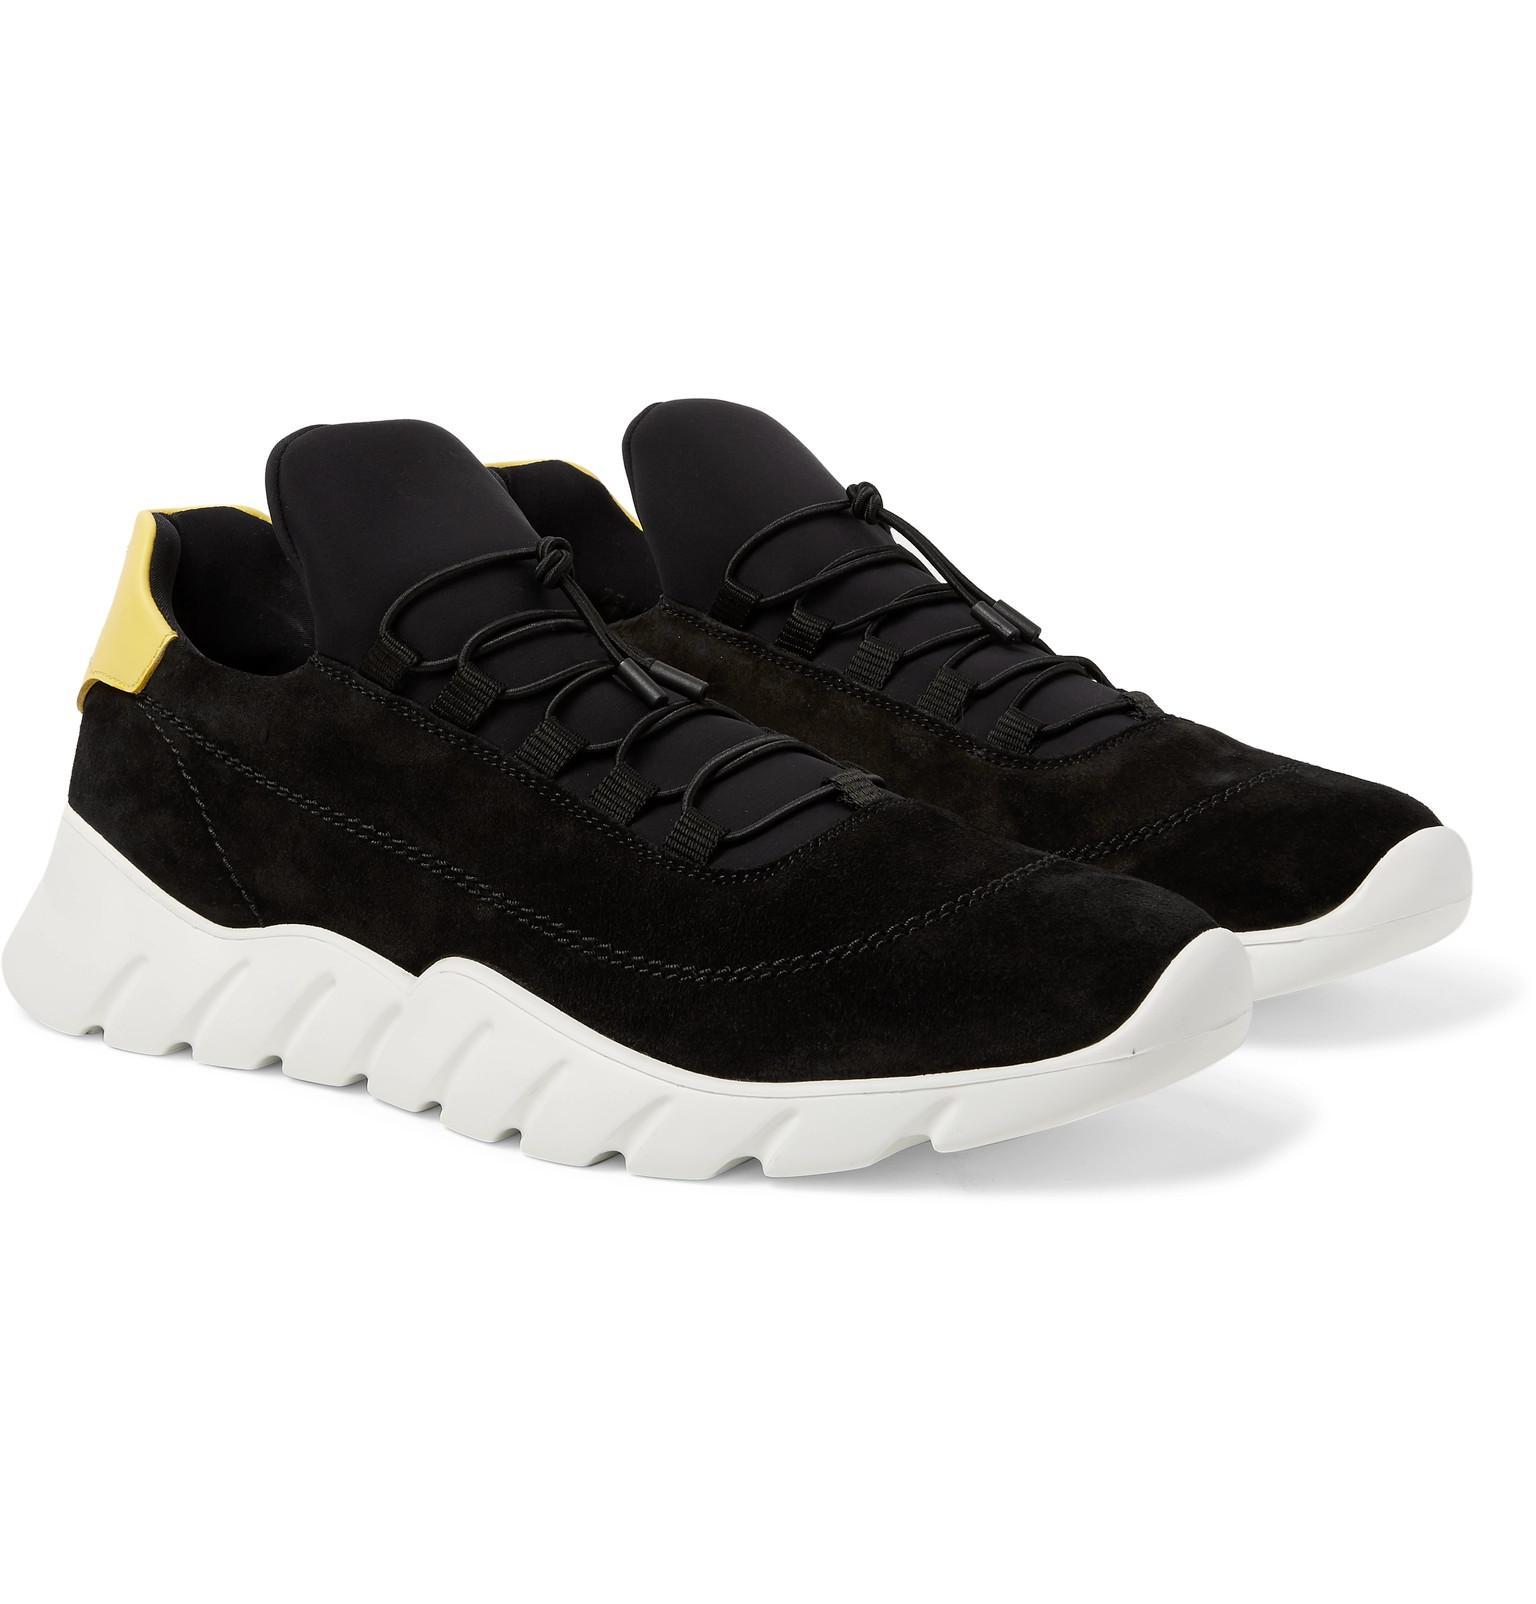 Fendi Suede And Neoprene Sneakers in